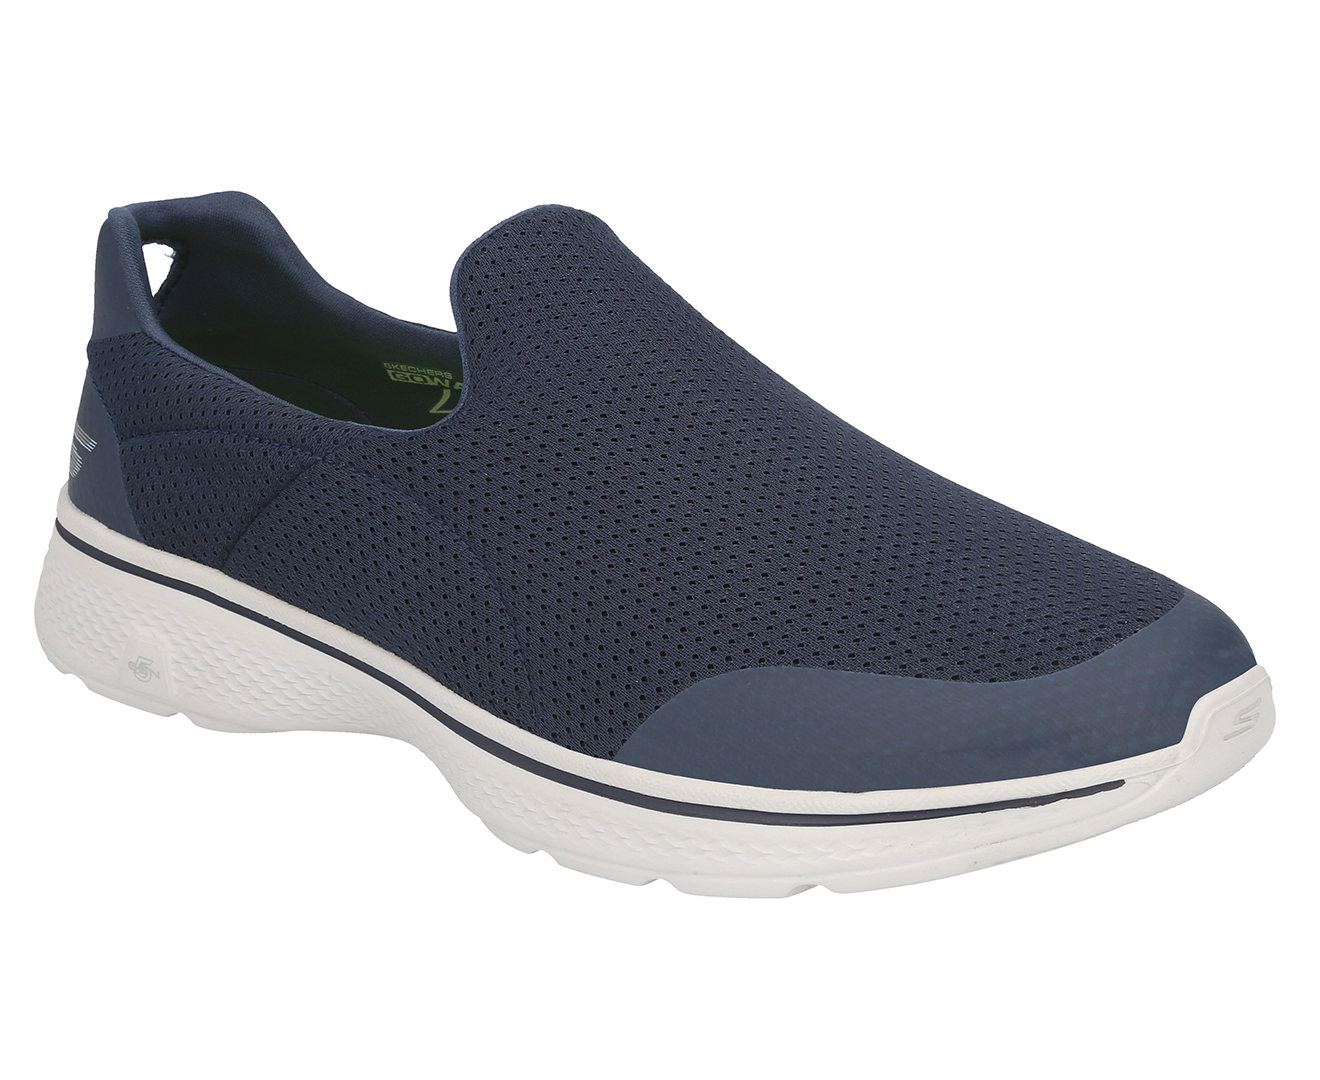 Details about Skechers Men's GOwalk 4 Incredible Slip On Shoe NavyGrey